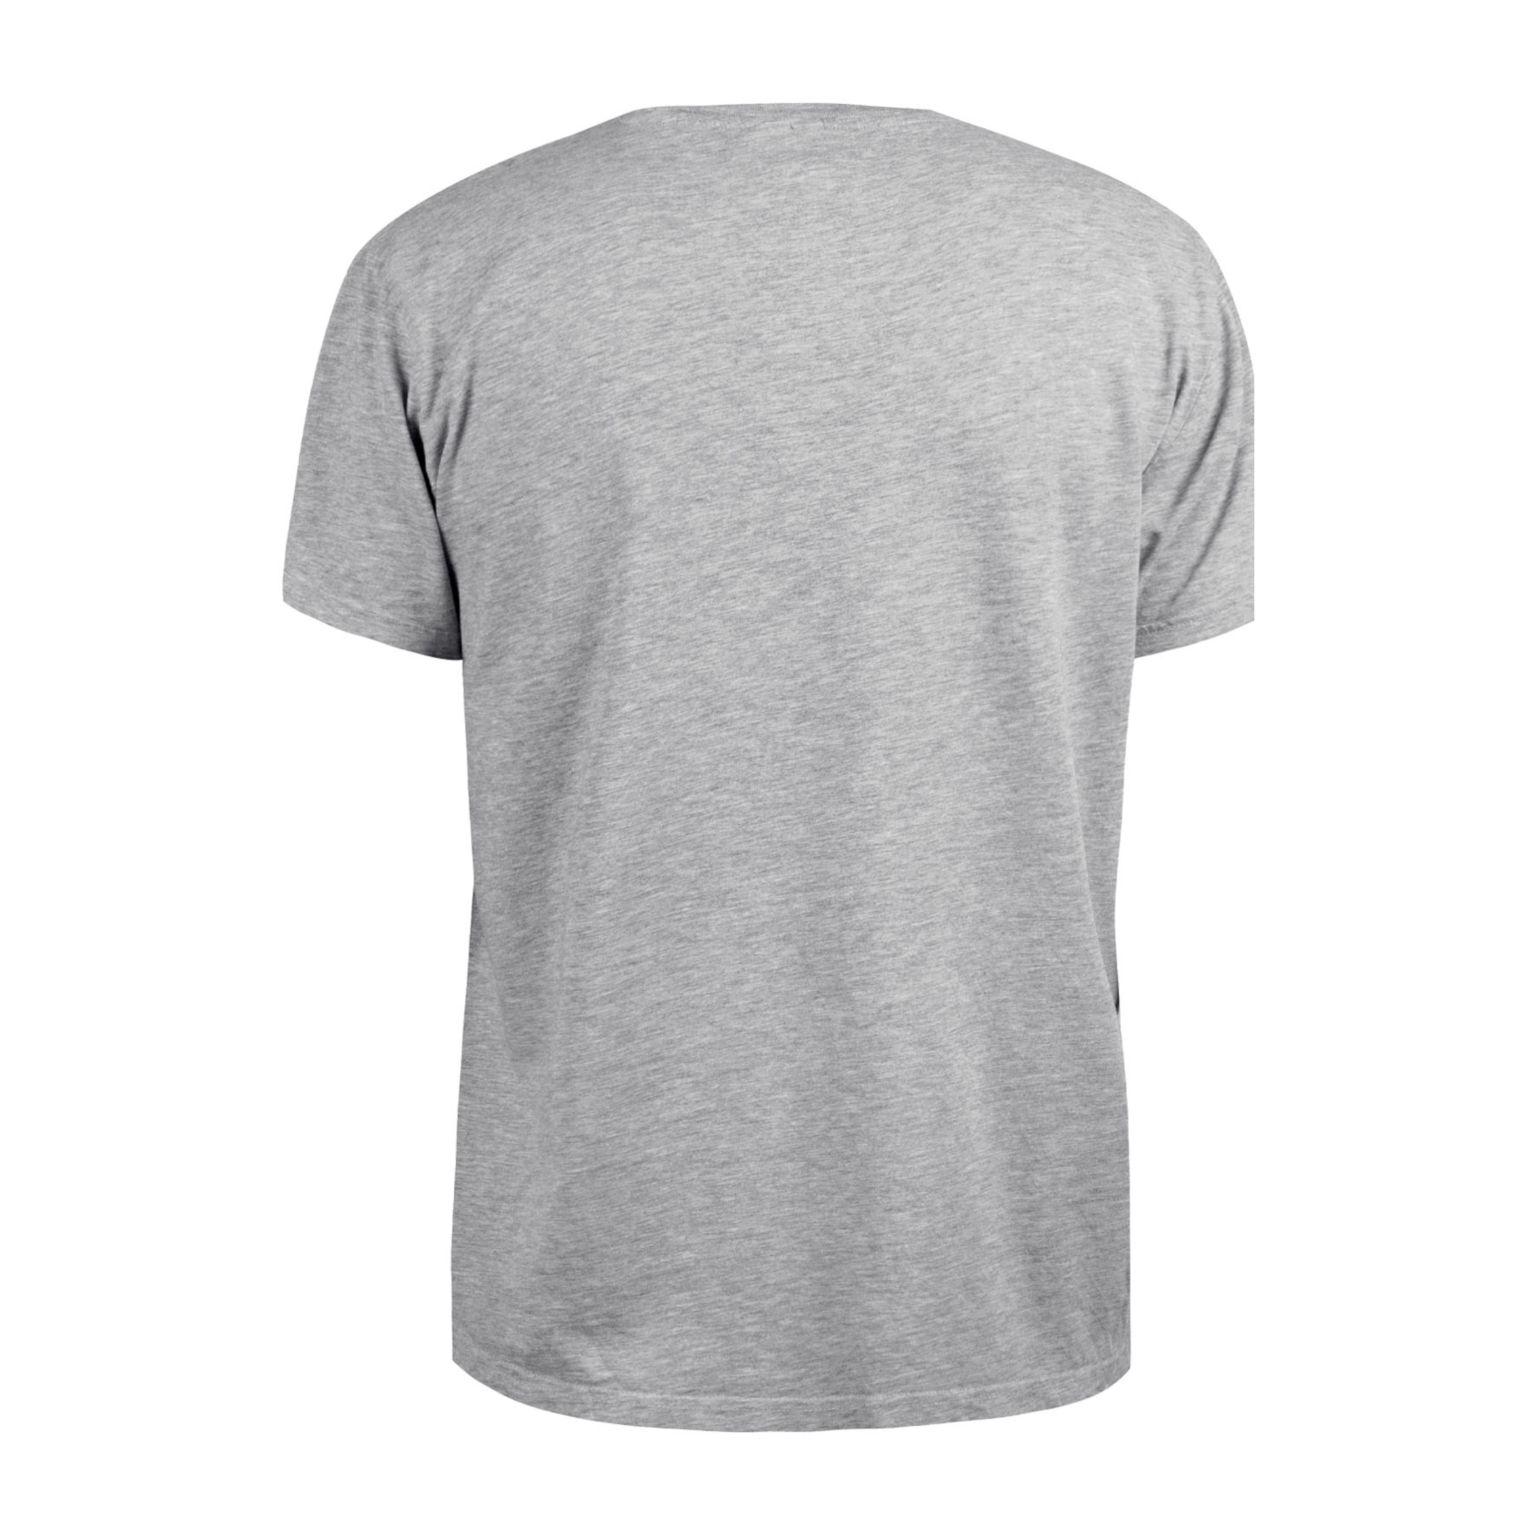 Tee shirt 150g taille xl